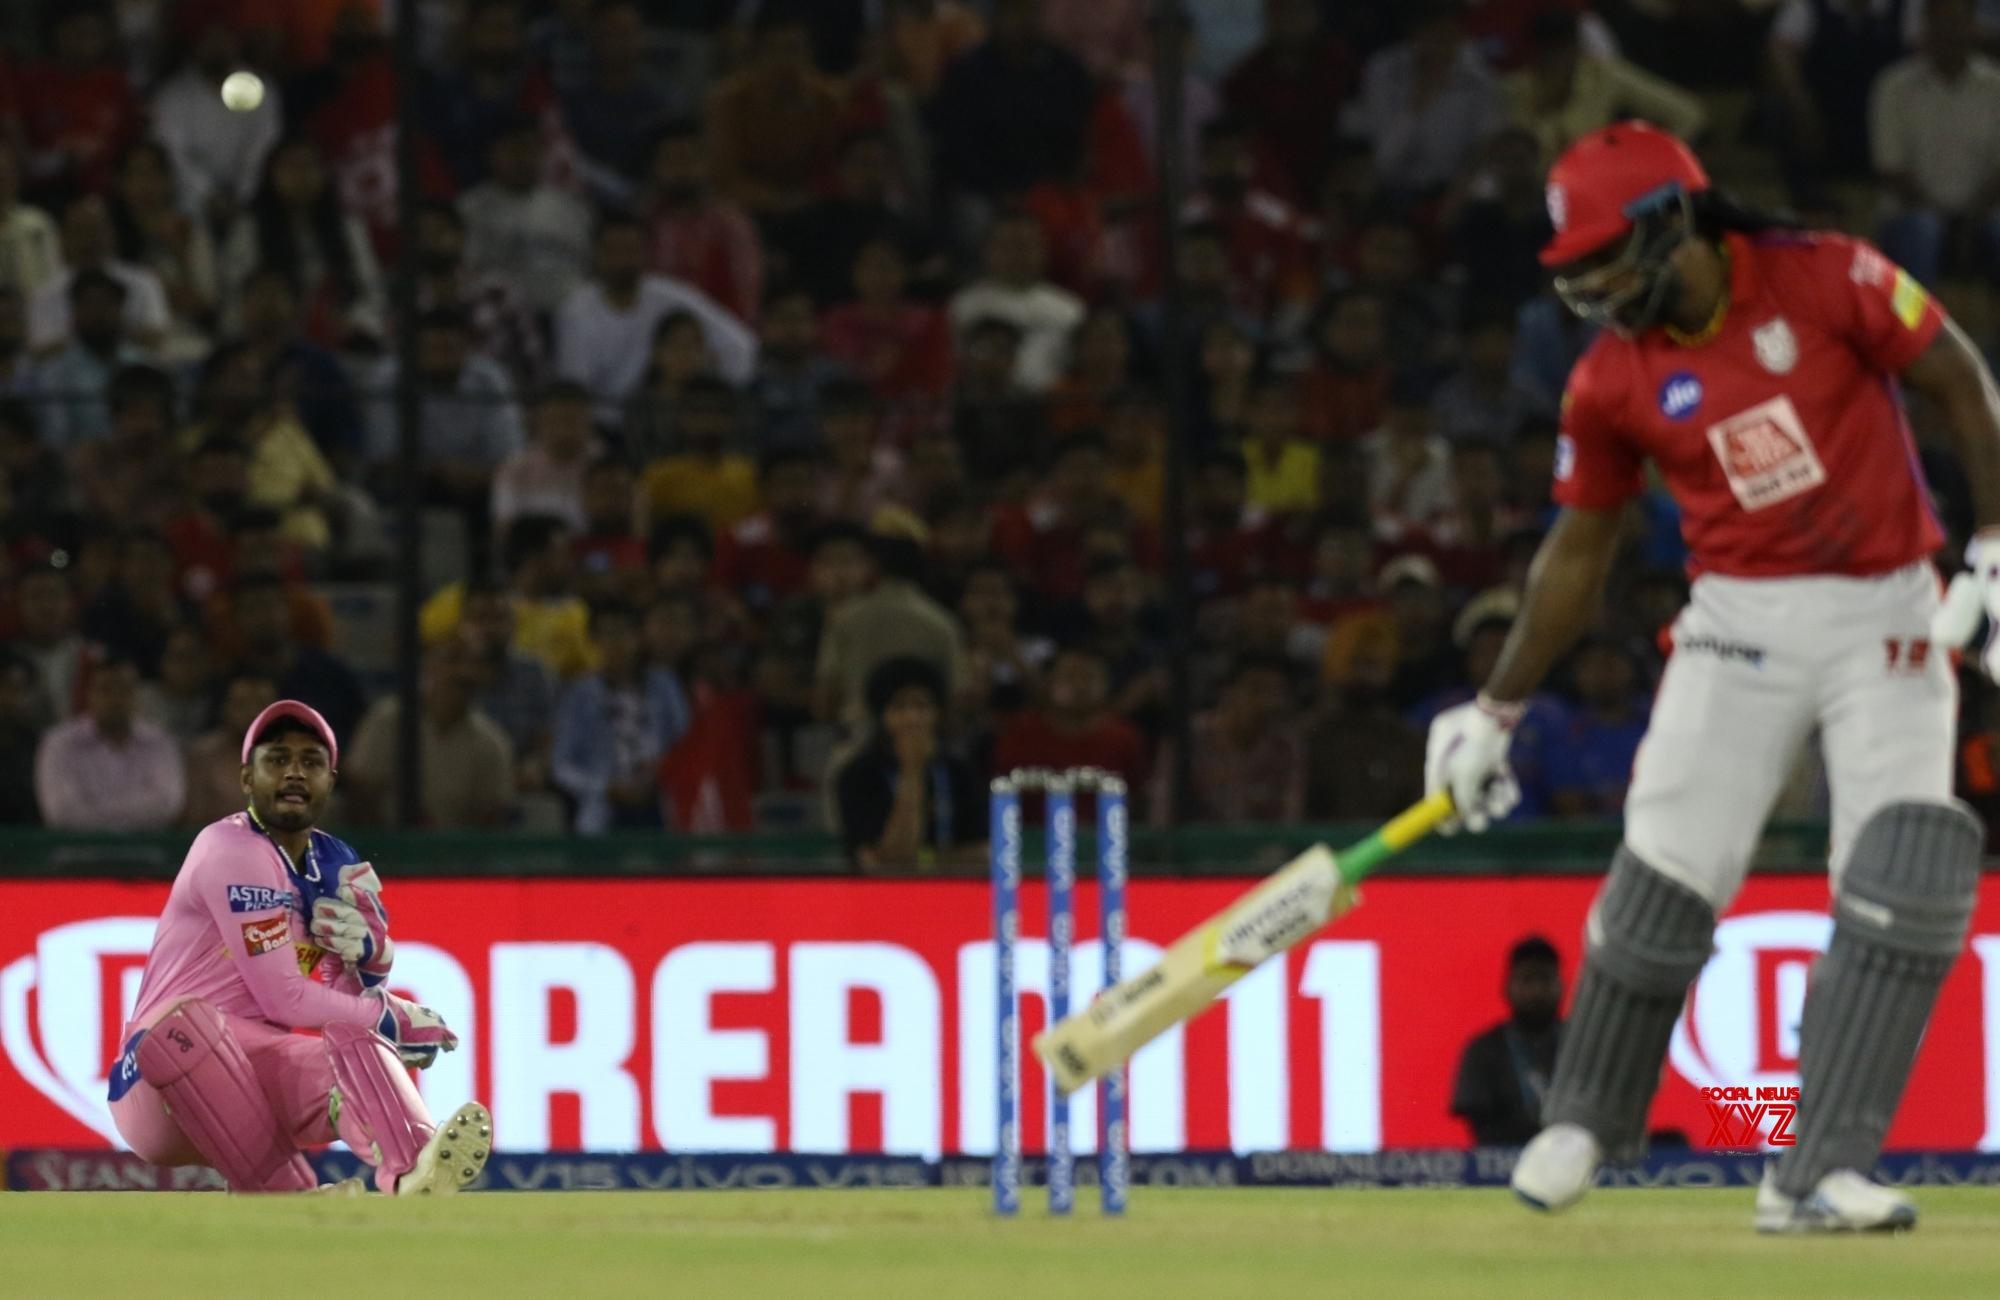 Mohali: IPL 2019 - Match 32 - Kings XI Punjab Vs Rajasthan Royals (Batch - 7) #Gallery